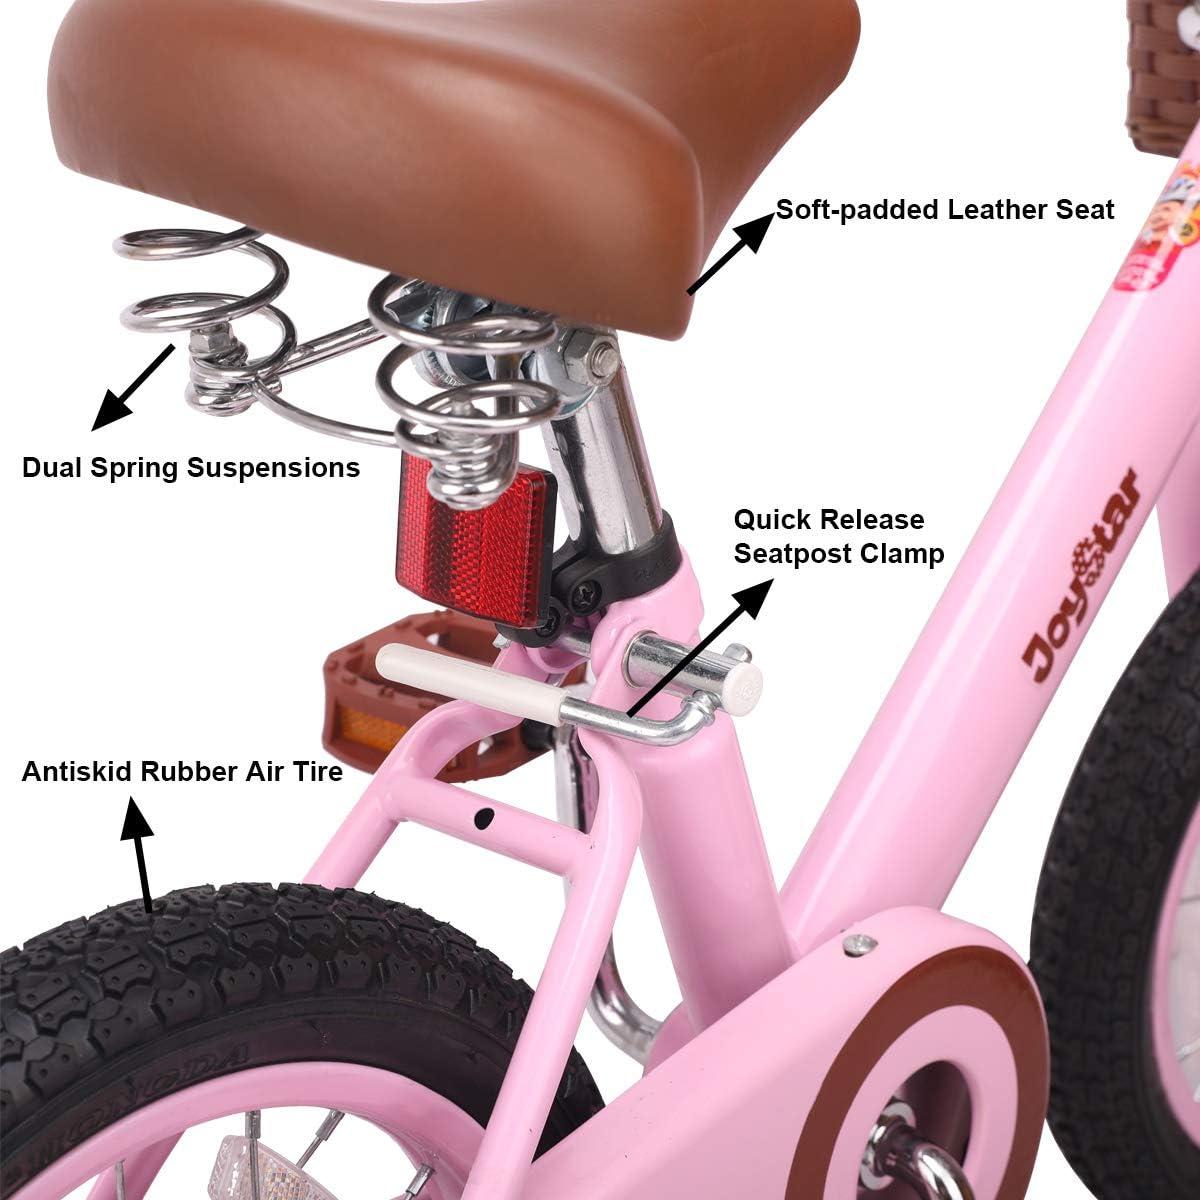 JOYSTAR 14 /& 16 Inch Kids Bike with Basket /& Training Wheels for 3-7 Years Old Girls /& Boys Ivory /& Pink